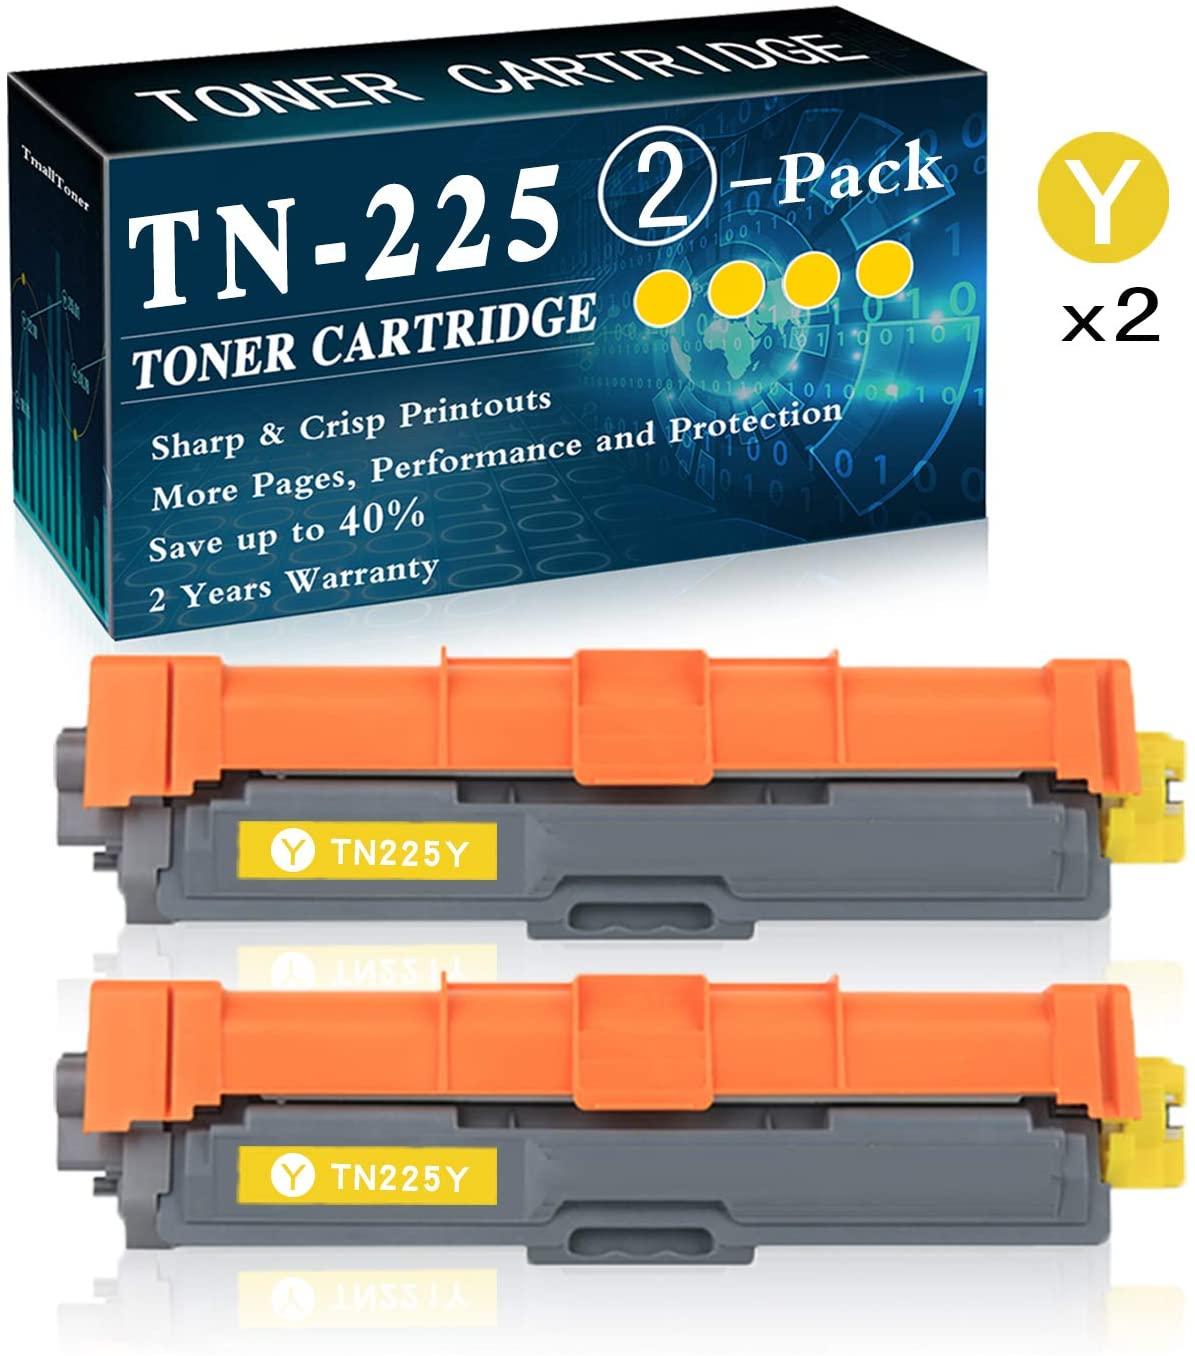 2-Pack Yellow TN-225 Toner Cartridge Replacement for Brother Laserjet HL-3140CW HL-3150CDN MFC-9130CW MFC-9330CDW DCP-9015CDW DCP-9020CDN Printer Printer,by TmallToner